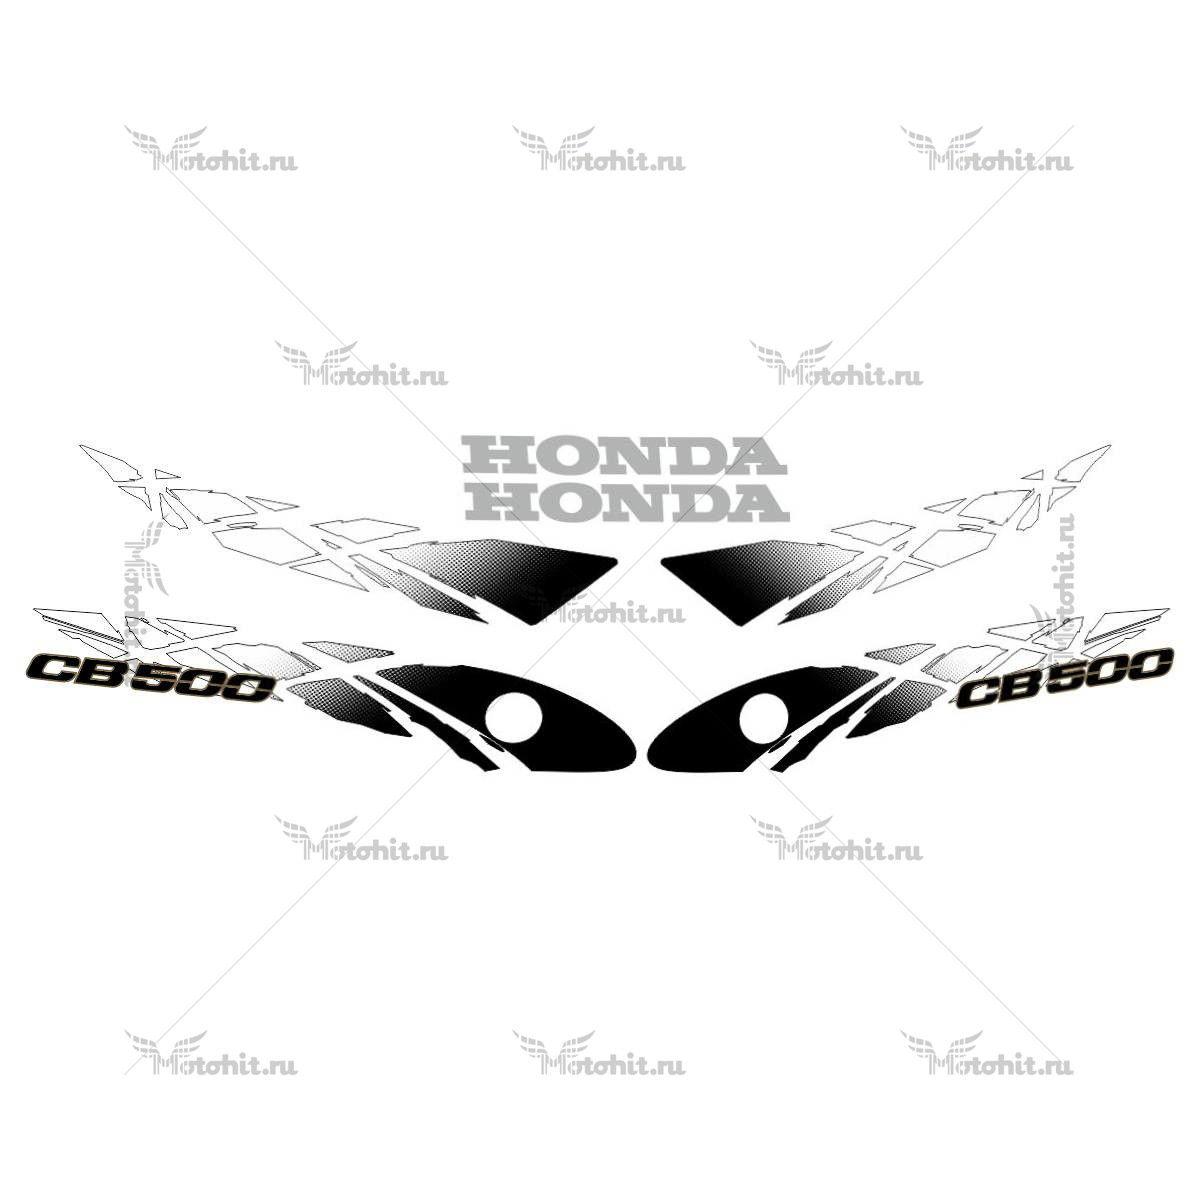 Комплект наклеек Honda CB-500-Е 1993-2003 BLACK-WHITE